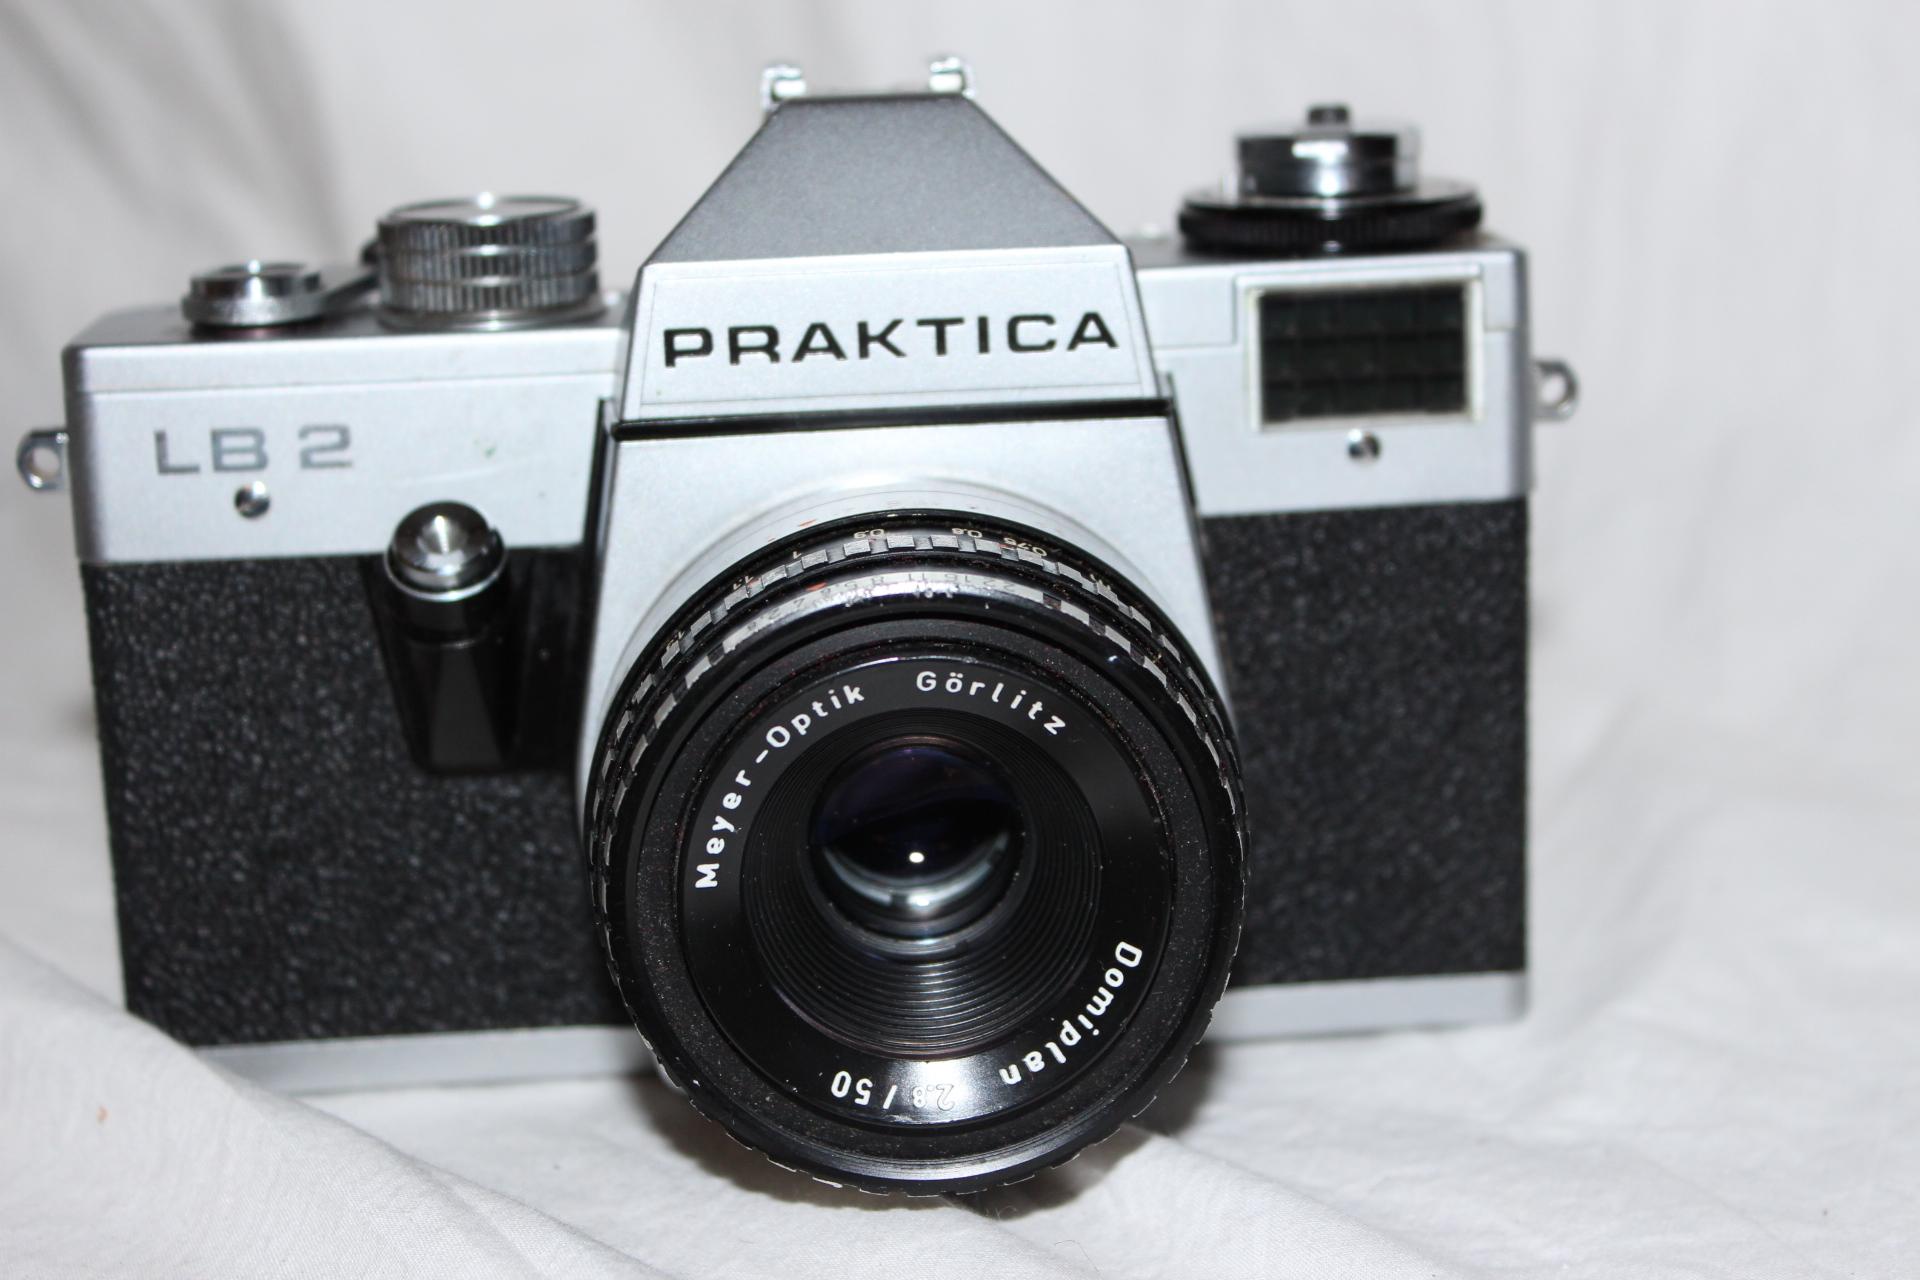 Pentacon camerapedia fandom powered by wikia